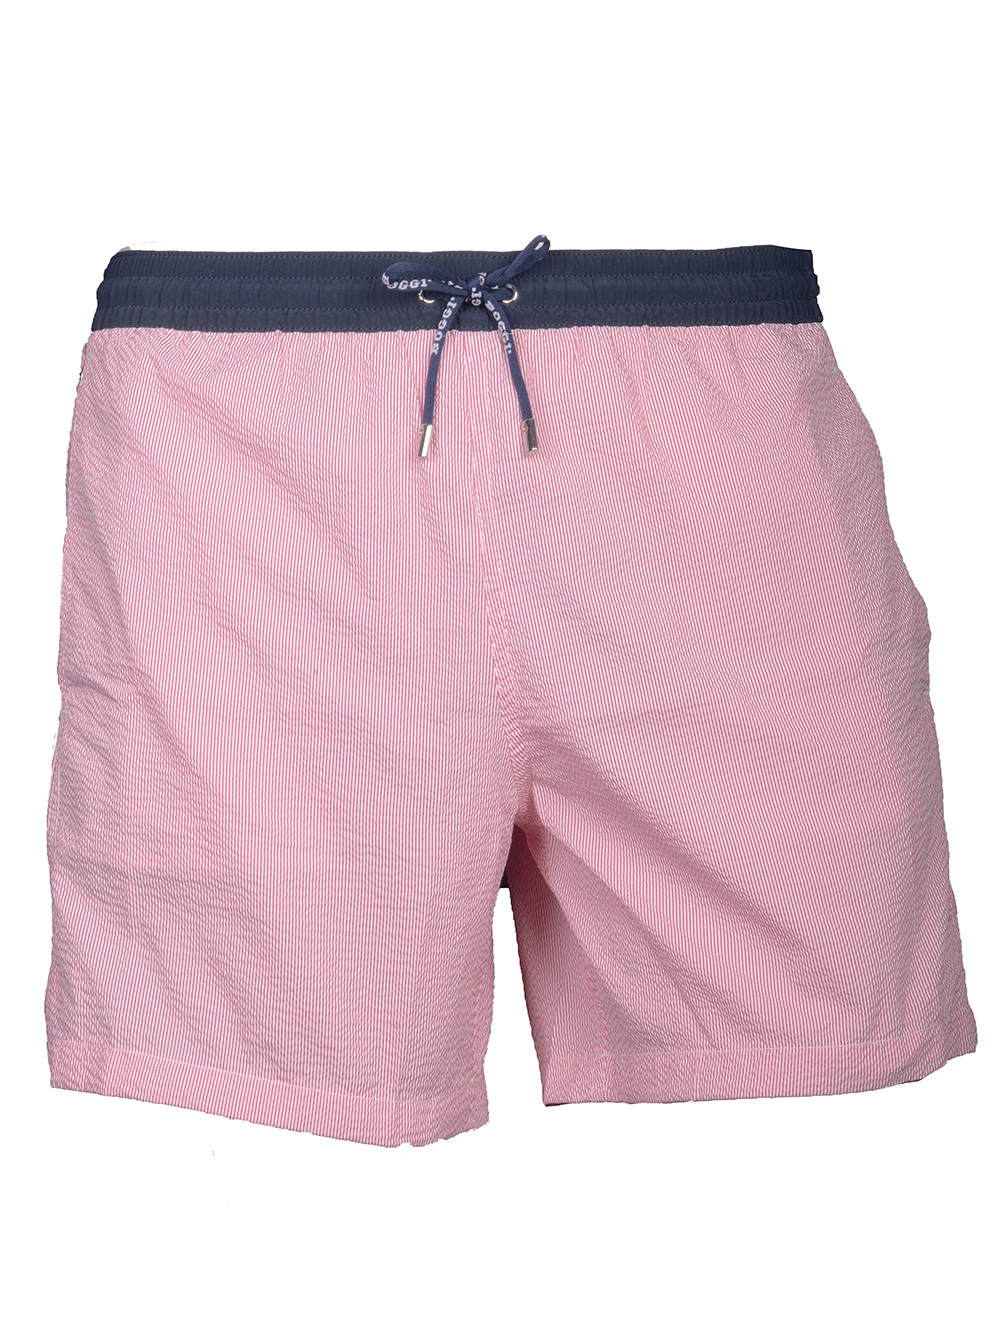 BOGGI Μαγιό shorts B018P092901 ΚΟΚΚΙΝΟ